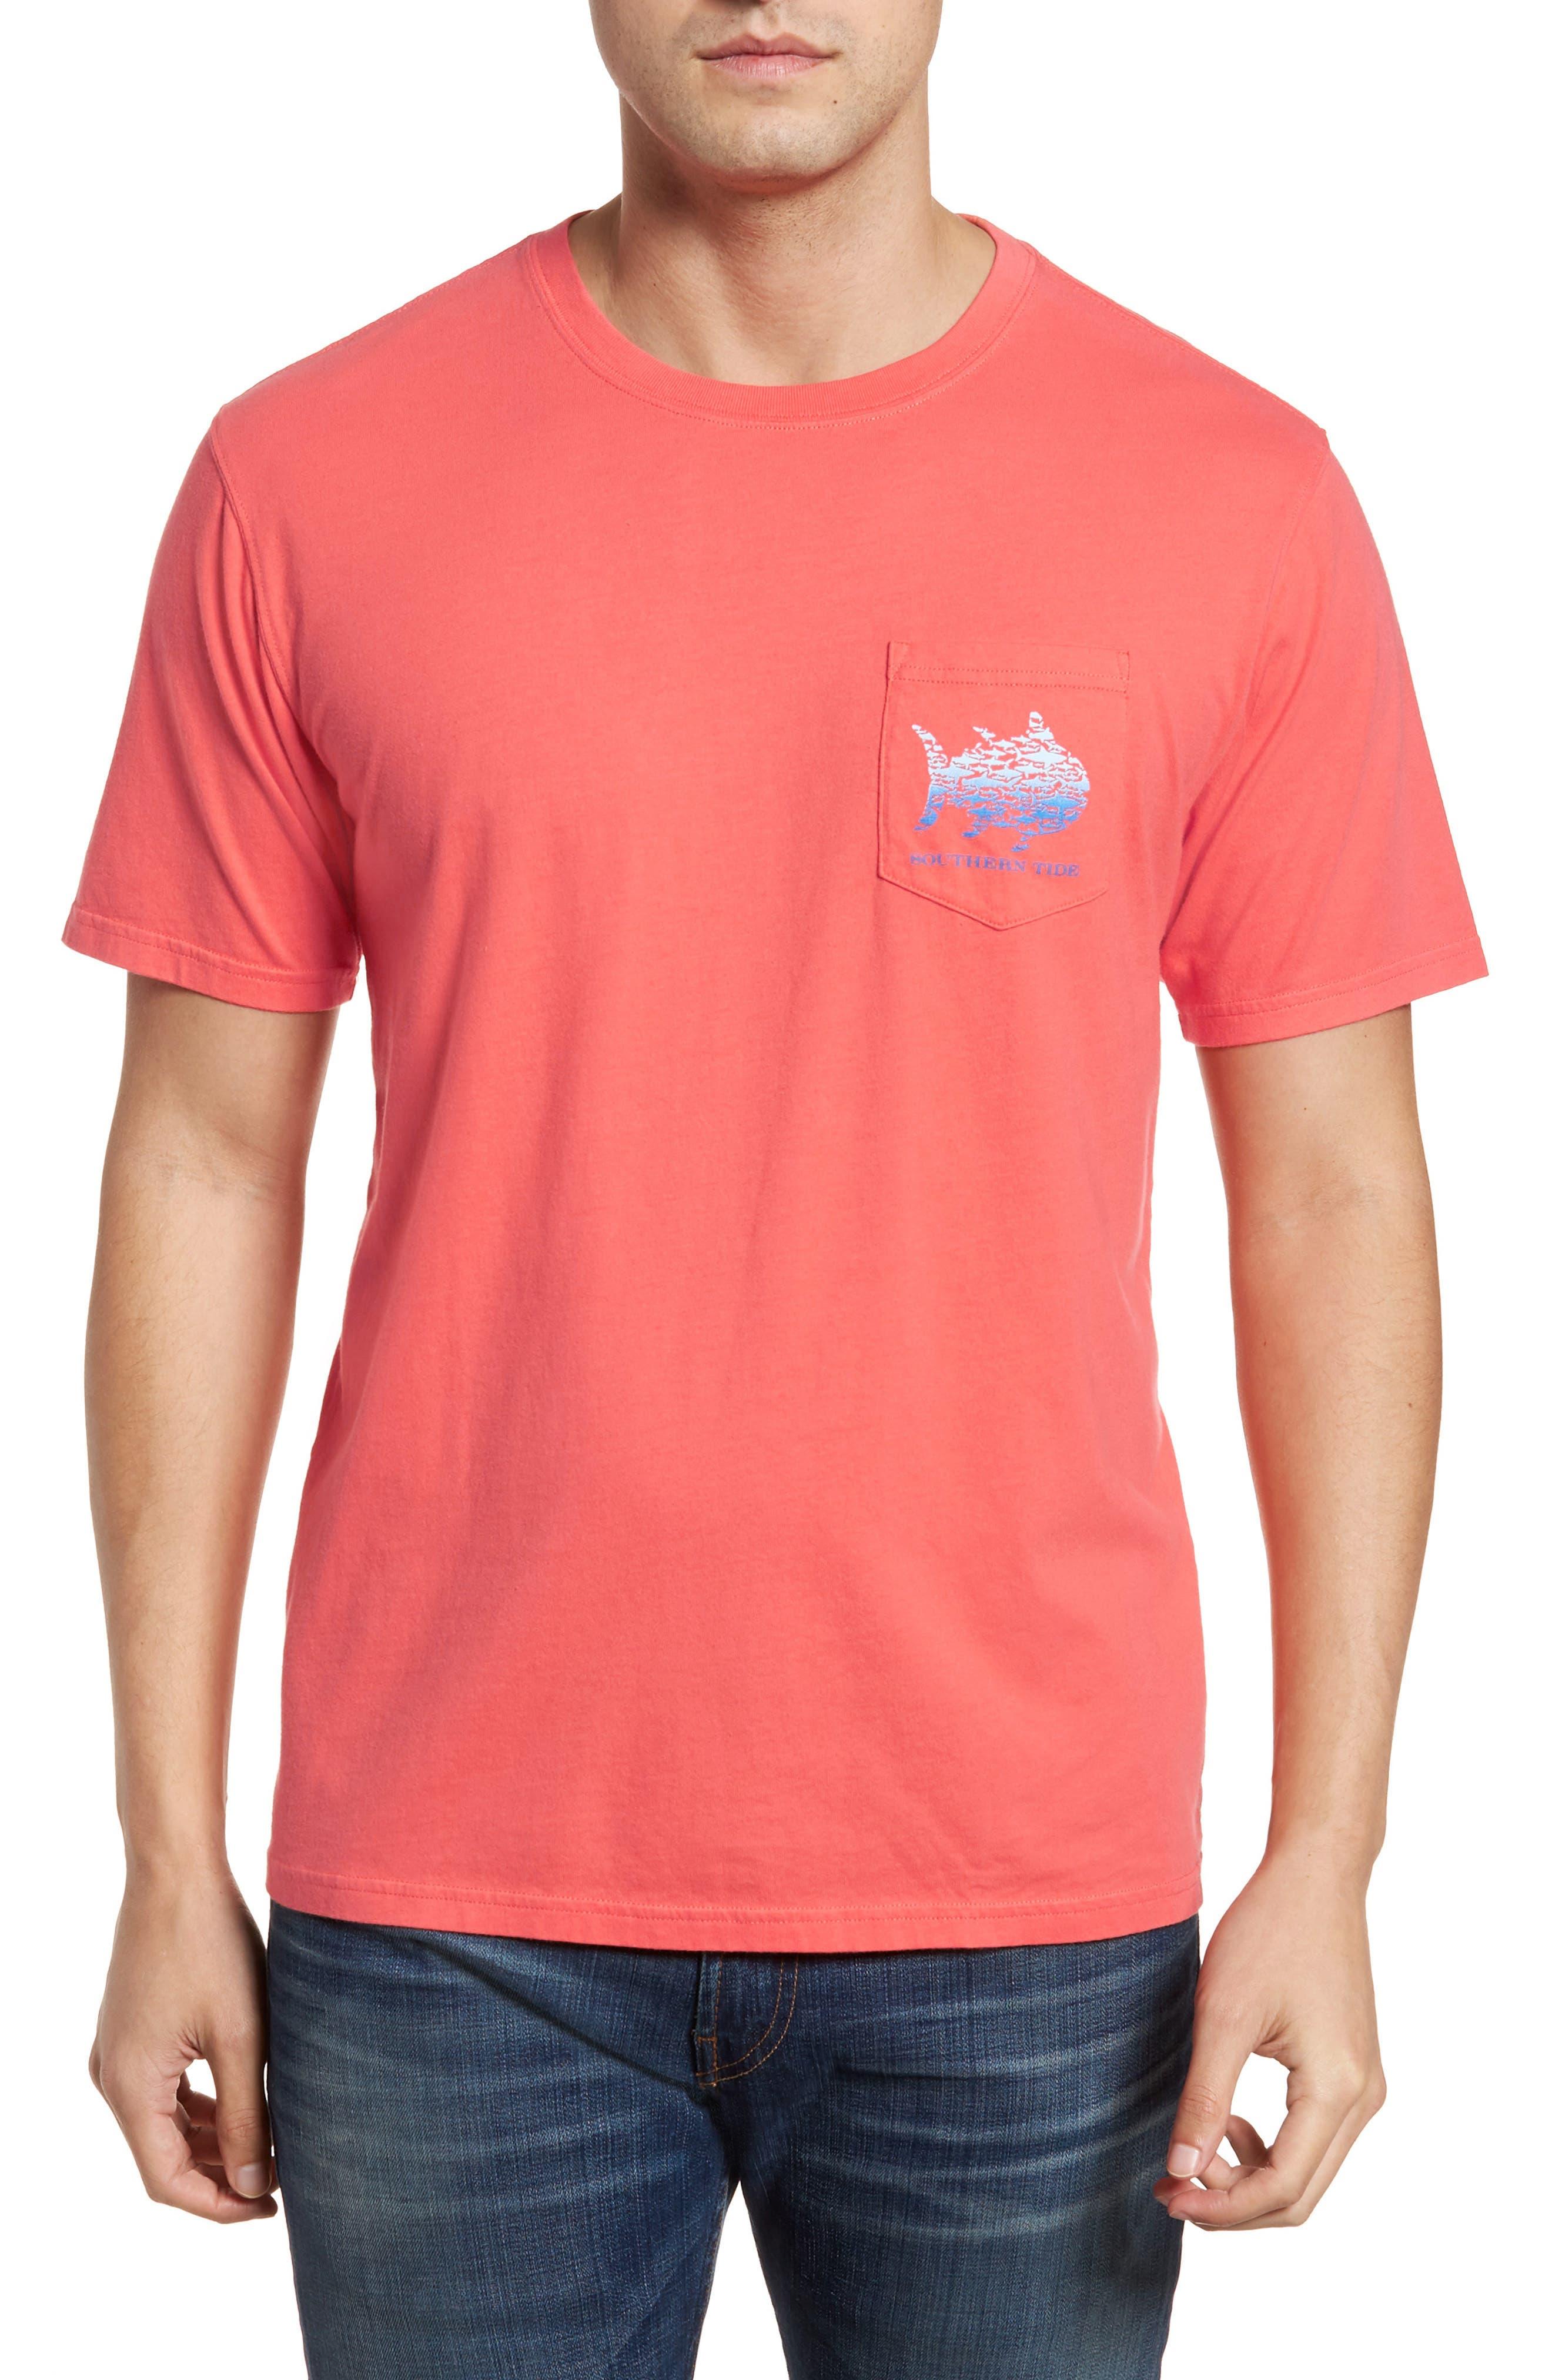 Main Image - Southern Tide School Of Sharks Crewneck Cotton T-Shirt